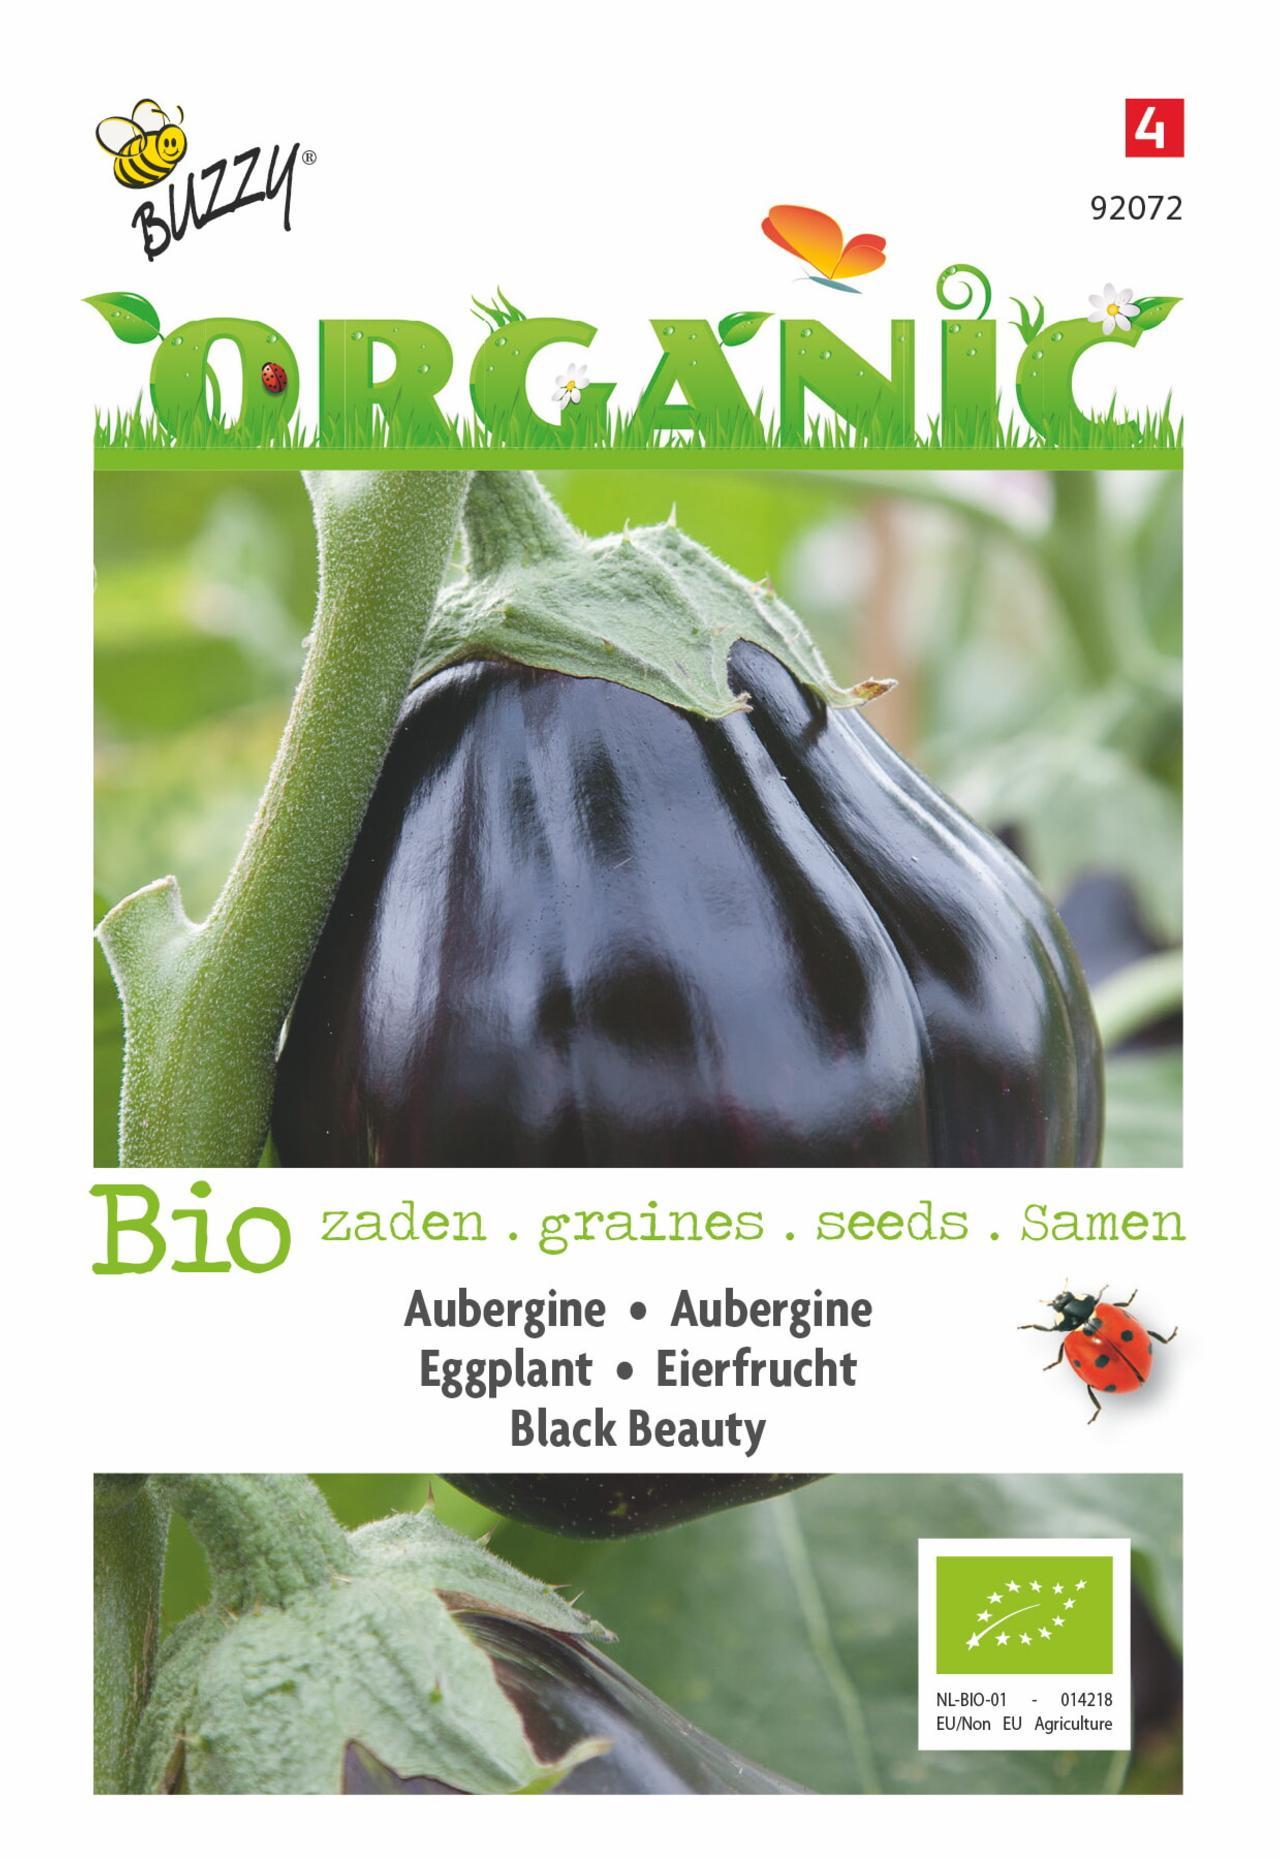 Solanum melongena 'Black Beauty' (BIO) plant